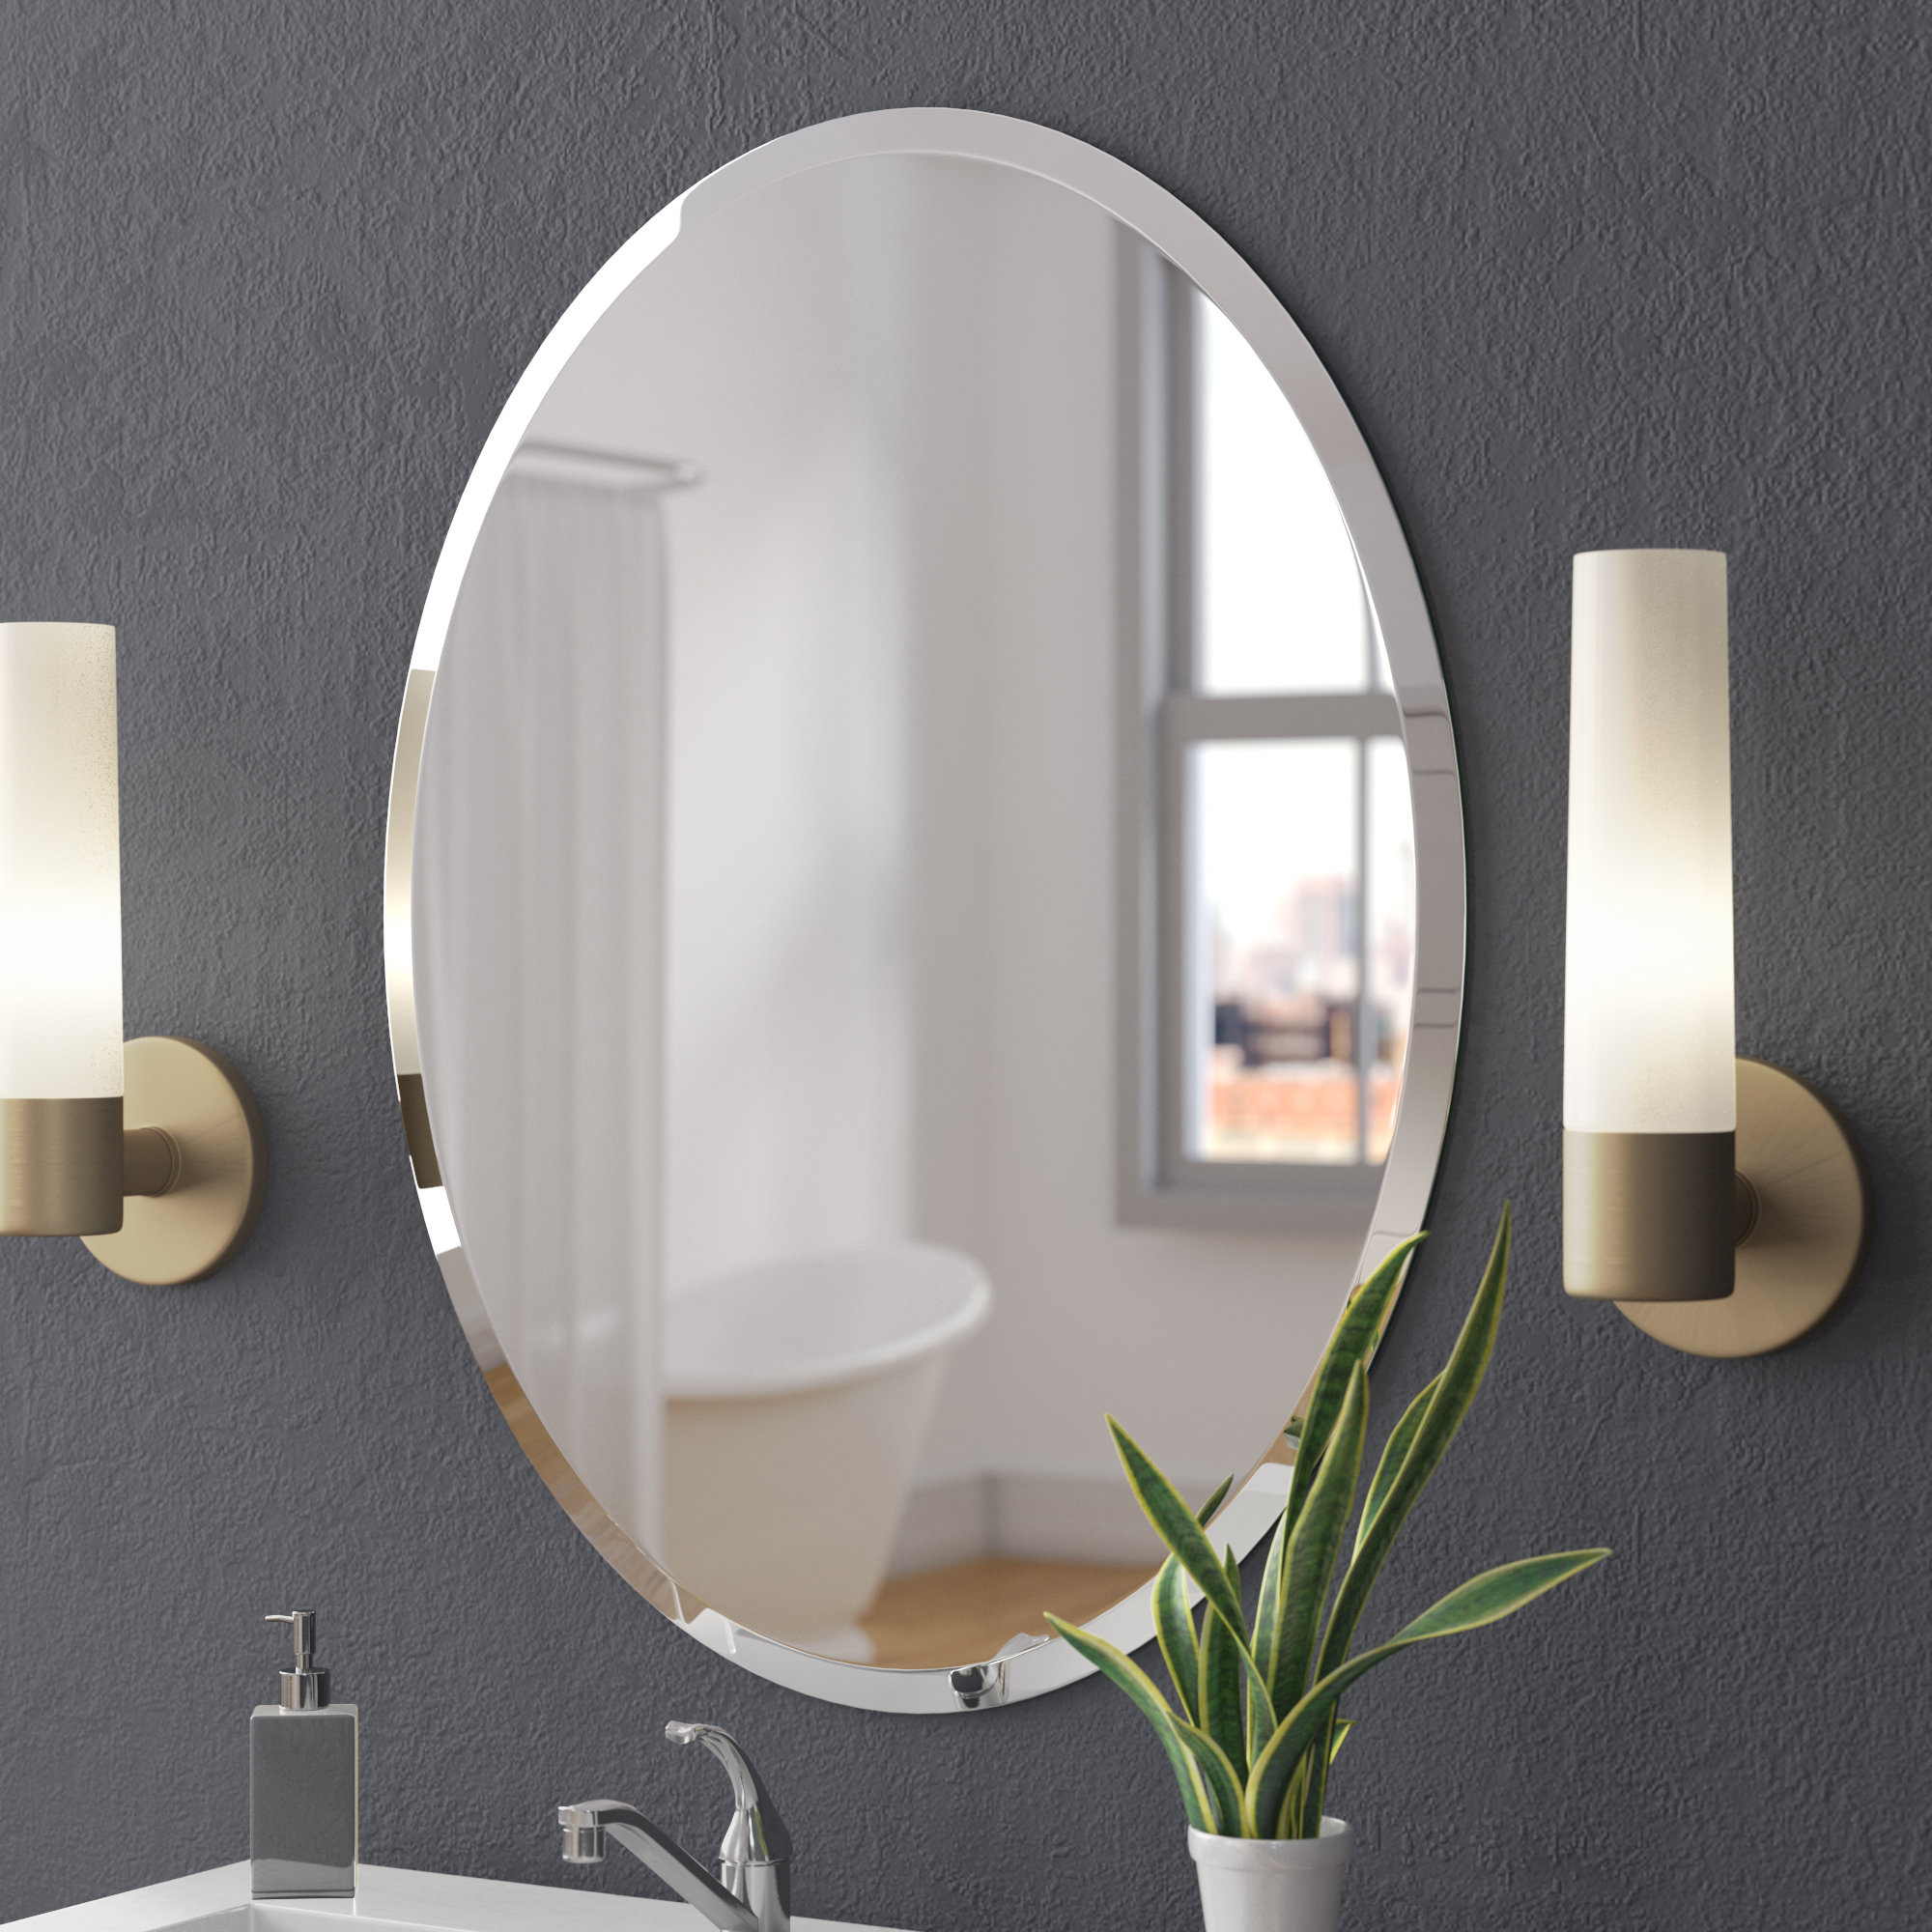 Callison Oval Bevel Frameless Wall Mirror Throughout Current Frameless Wall Mirrors (View 11 of 20)